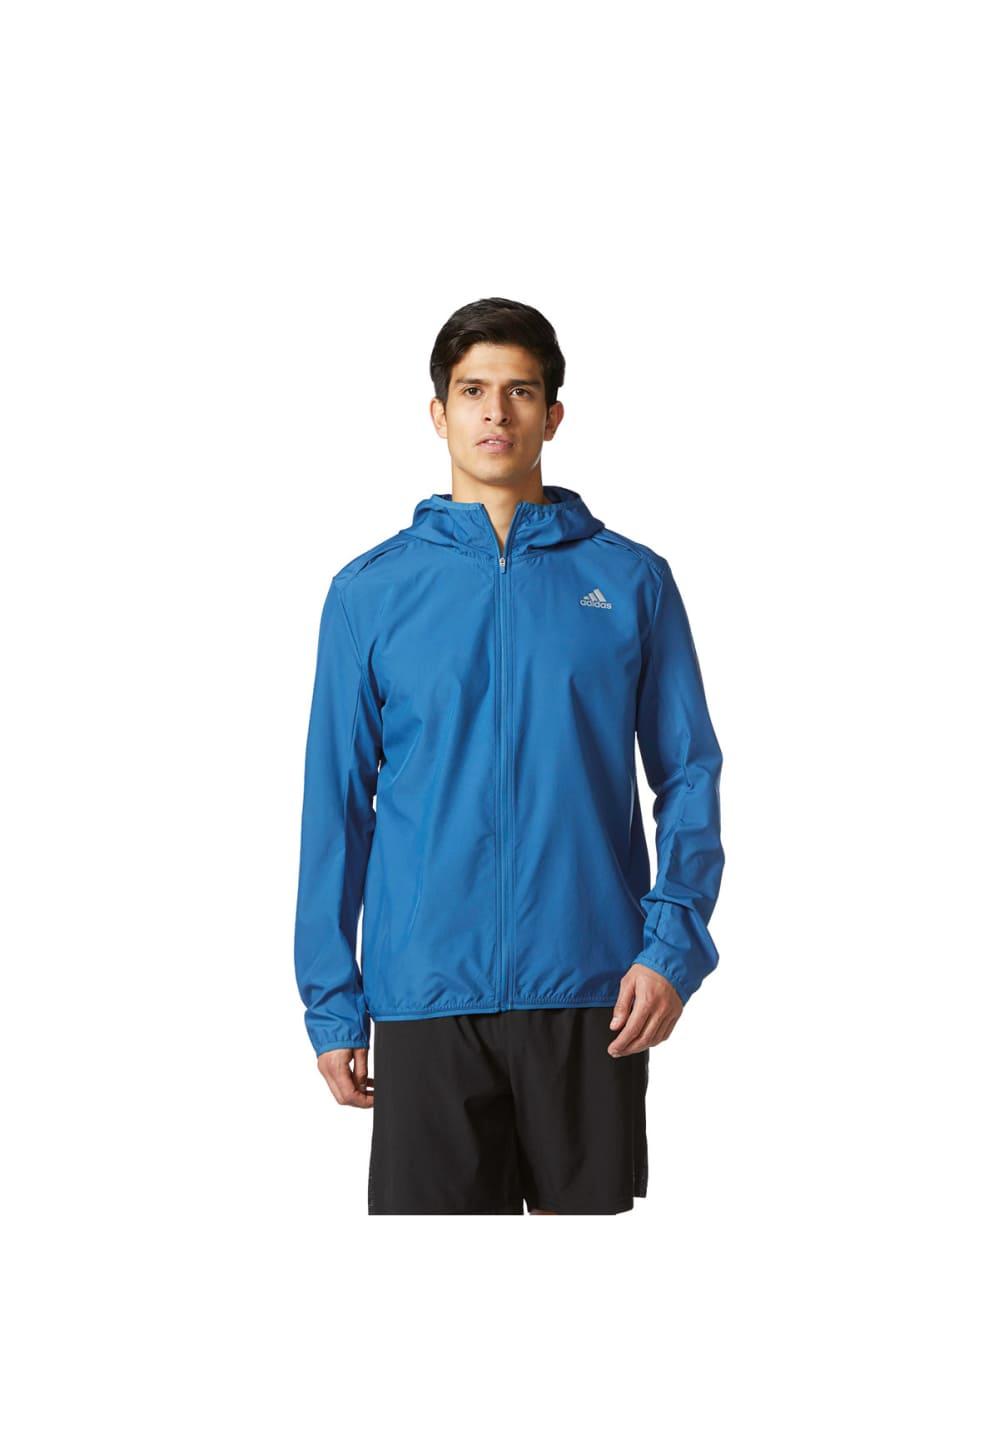 Adidas Response Wind Jacket Men's Running Sports Jacket